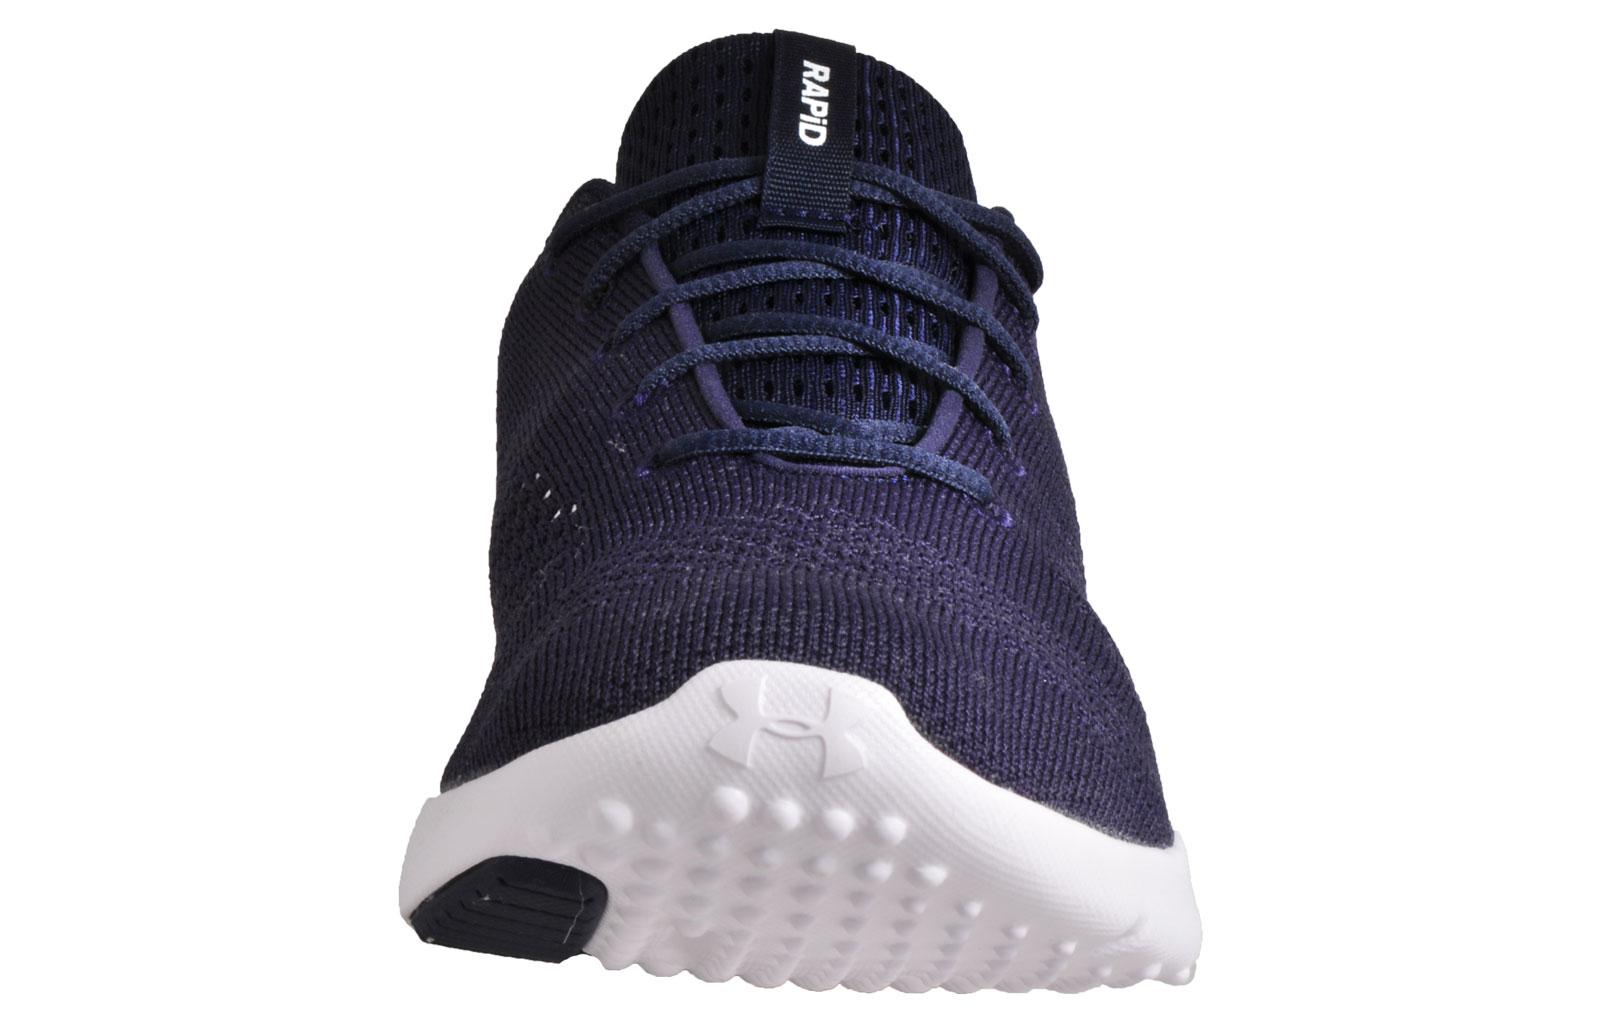 Single Toe Running Shoes